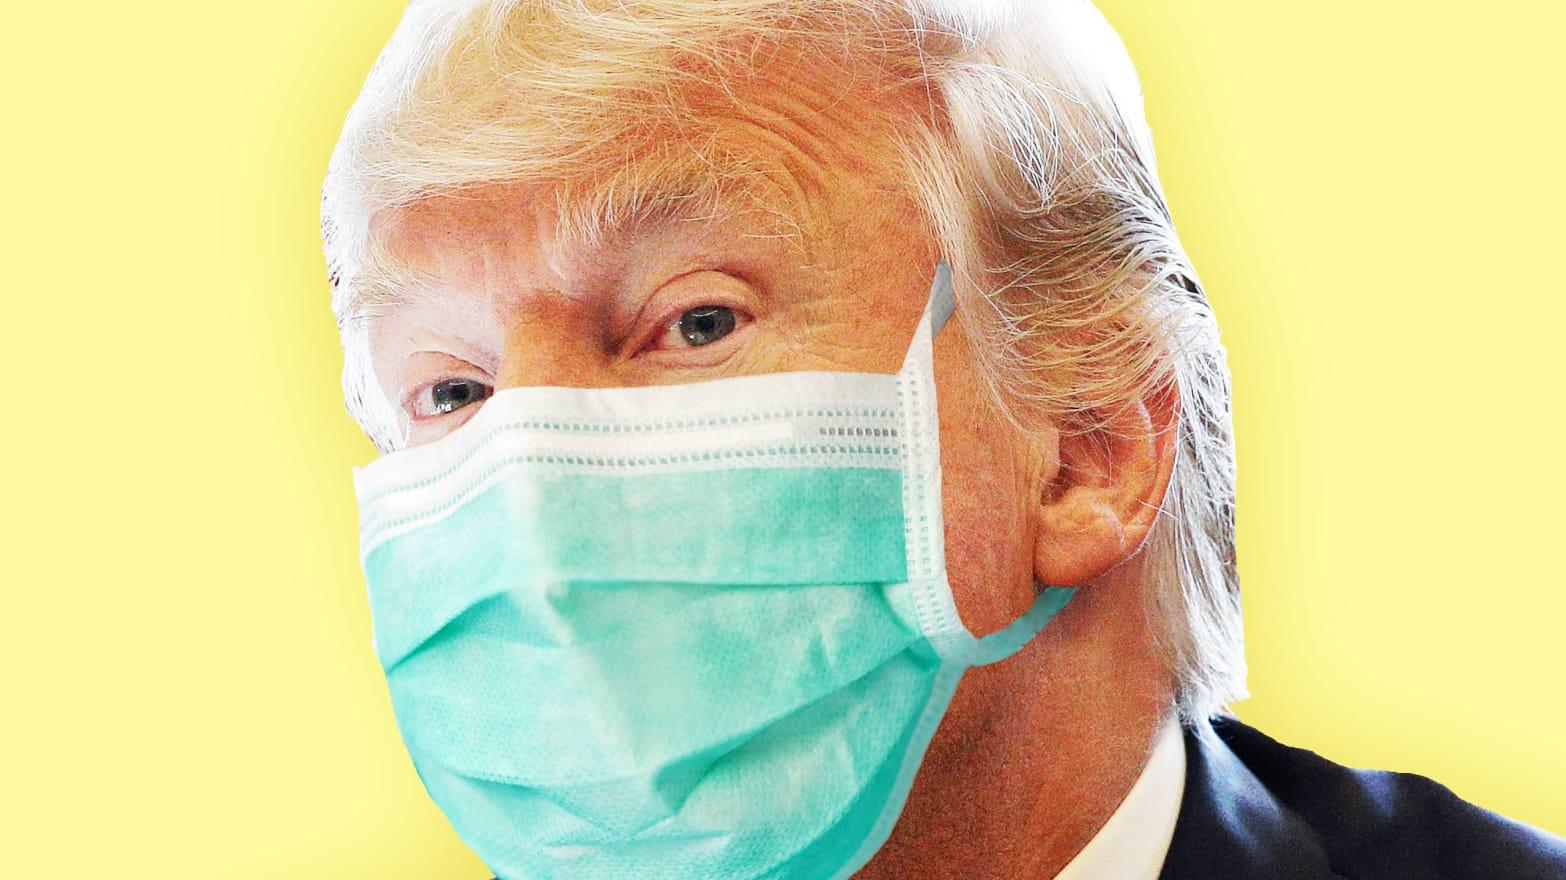 gop to sick people